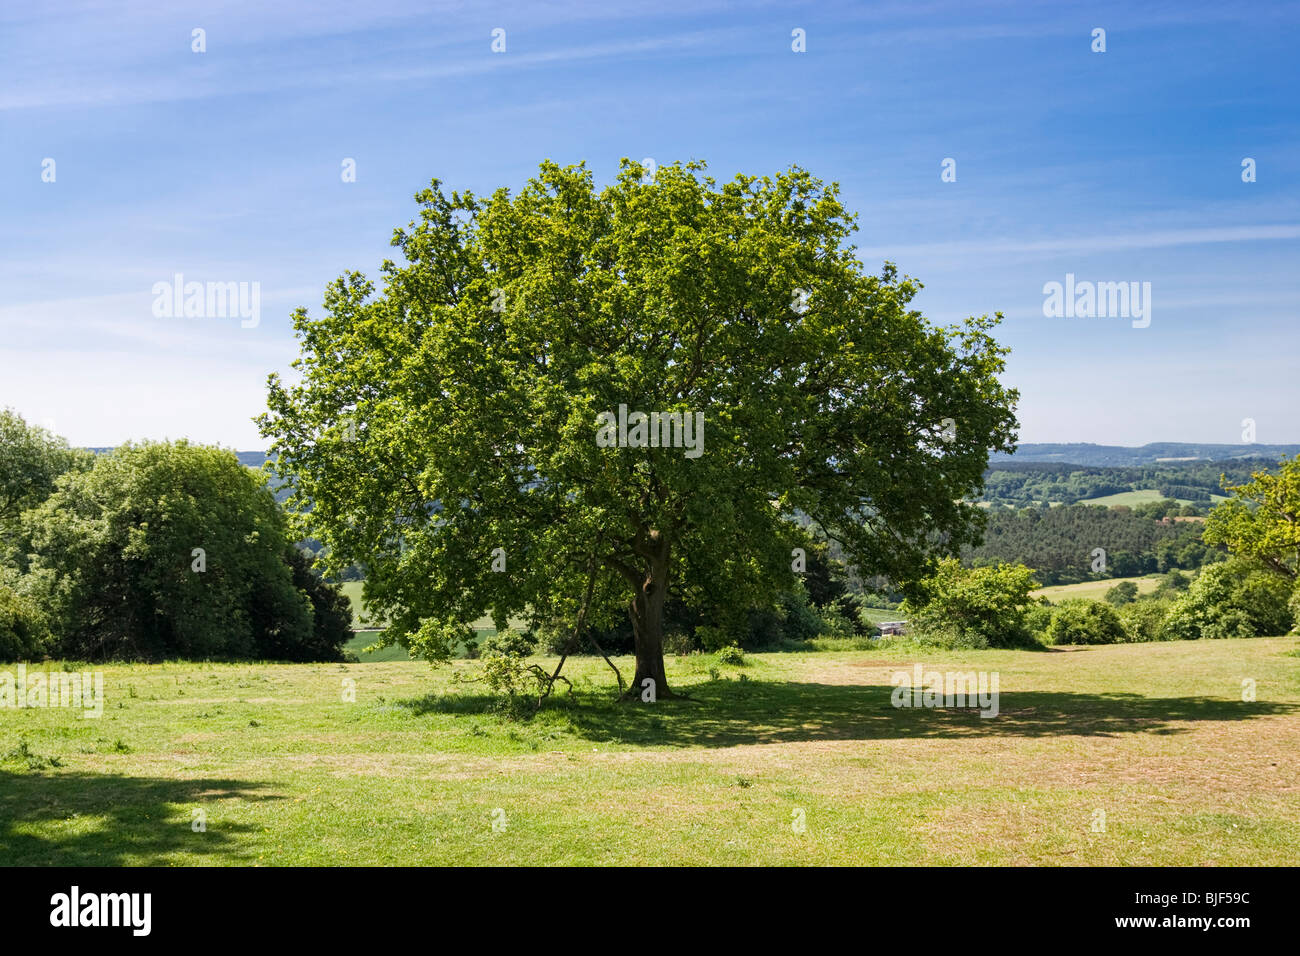 Oak tree at Newlands Corner, Surrey, England, UK - Stock Image